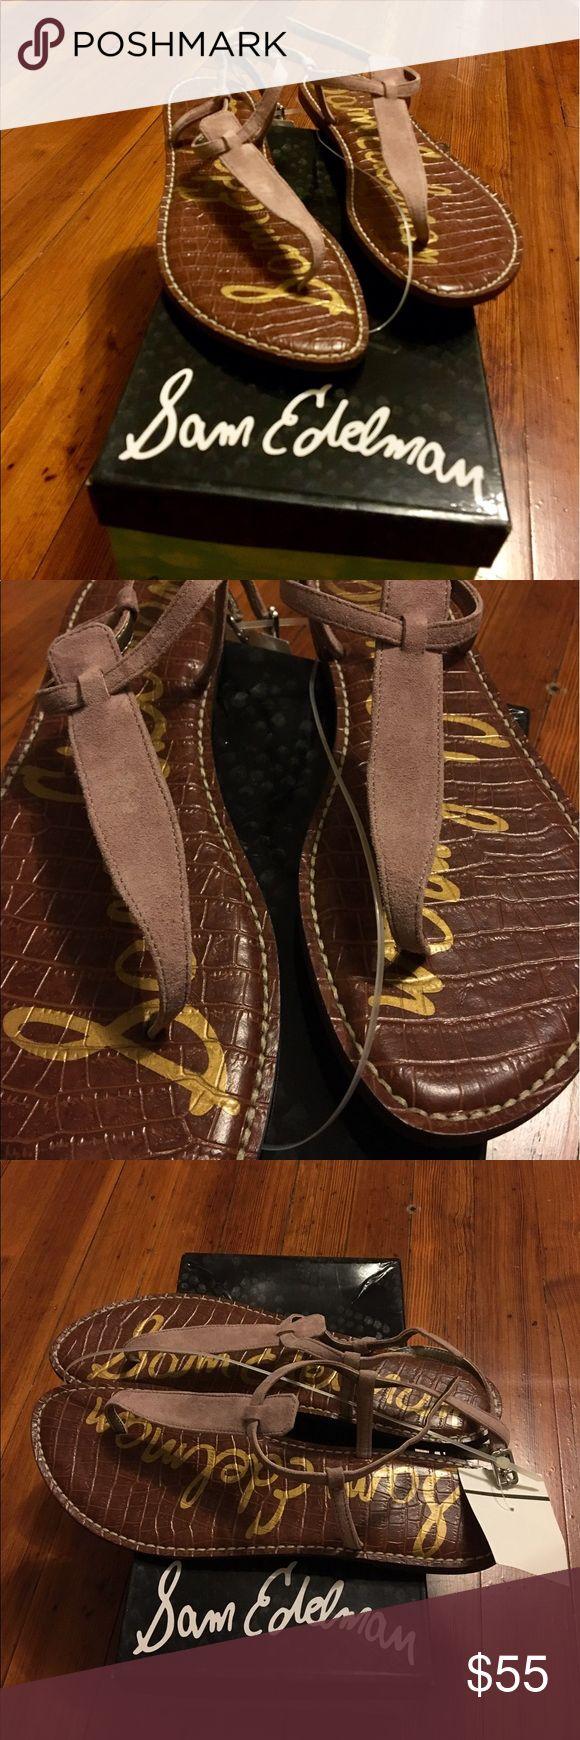 NWT Sam Edelman Gigi suede sandals Beautiful mauve suede sandals - brand new! The Sam Edelman classic sandal comfortable and chic! Sam Edelman Shoes Sandals